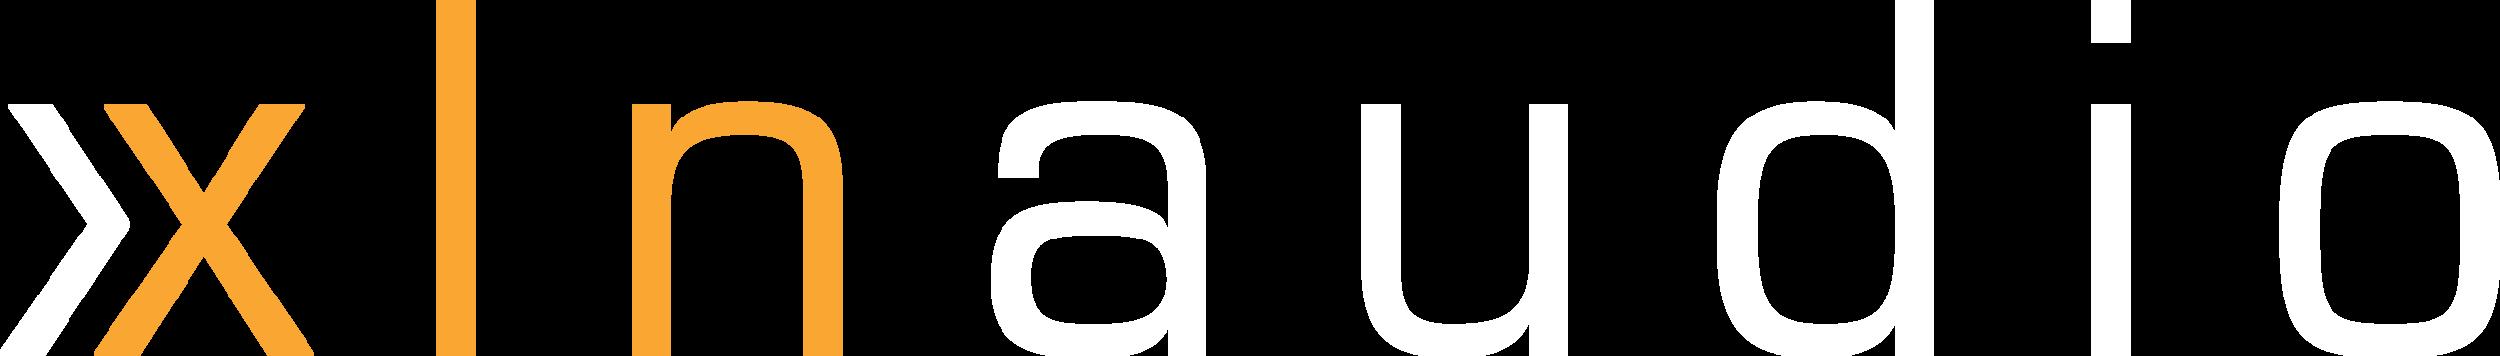 xlnaudio_logo_negative.png